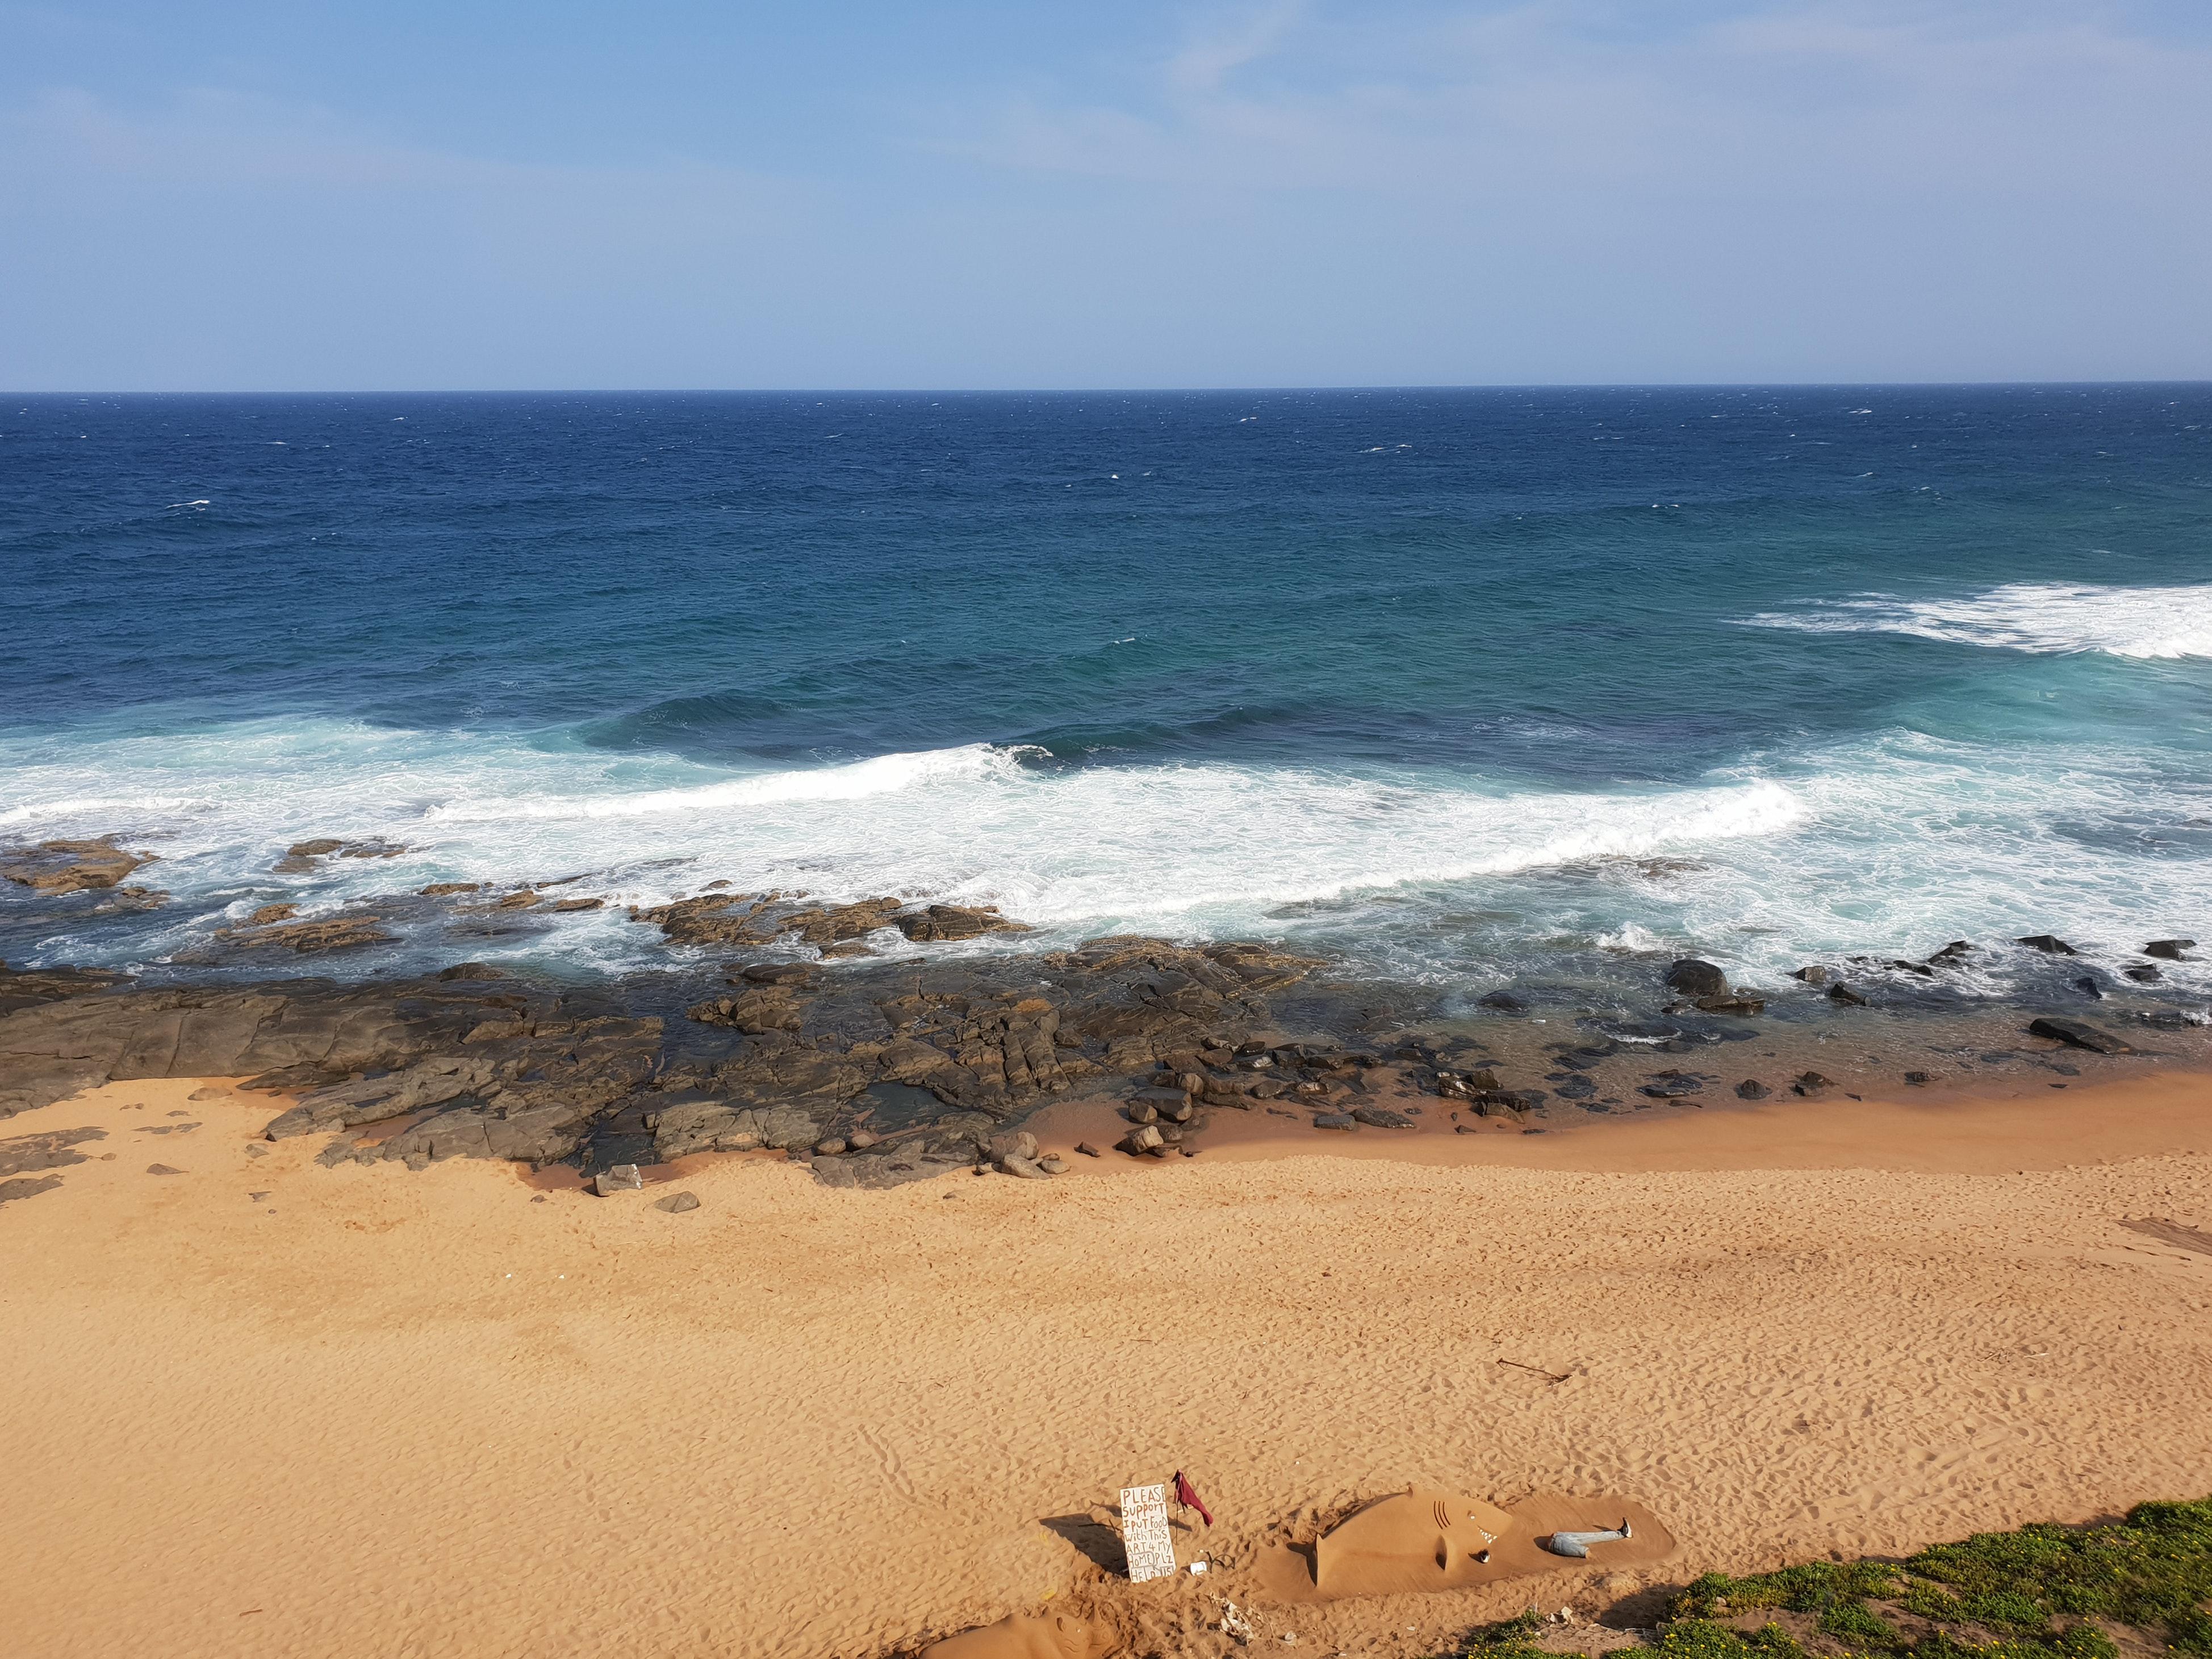 Waves crashing on the sandy beach, Waves crashing on the sandy beach